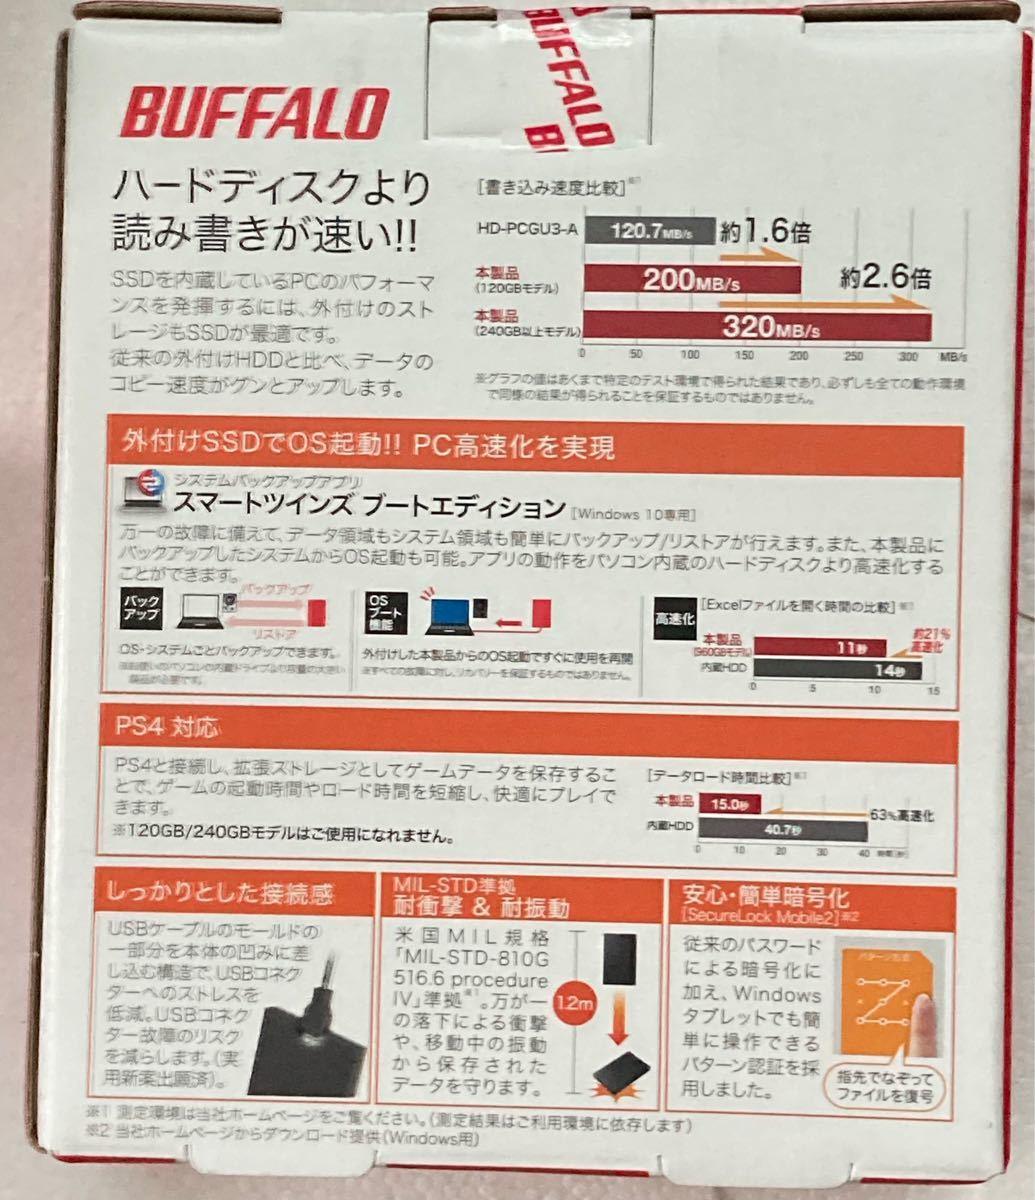 SSD-PG960U3-BA [外付けSSD SSD-PGU3-Aシリーズ 960GB ブラック]